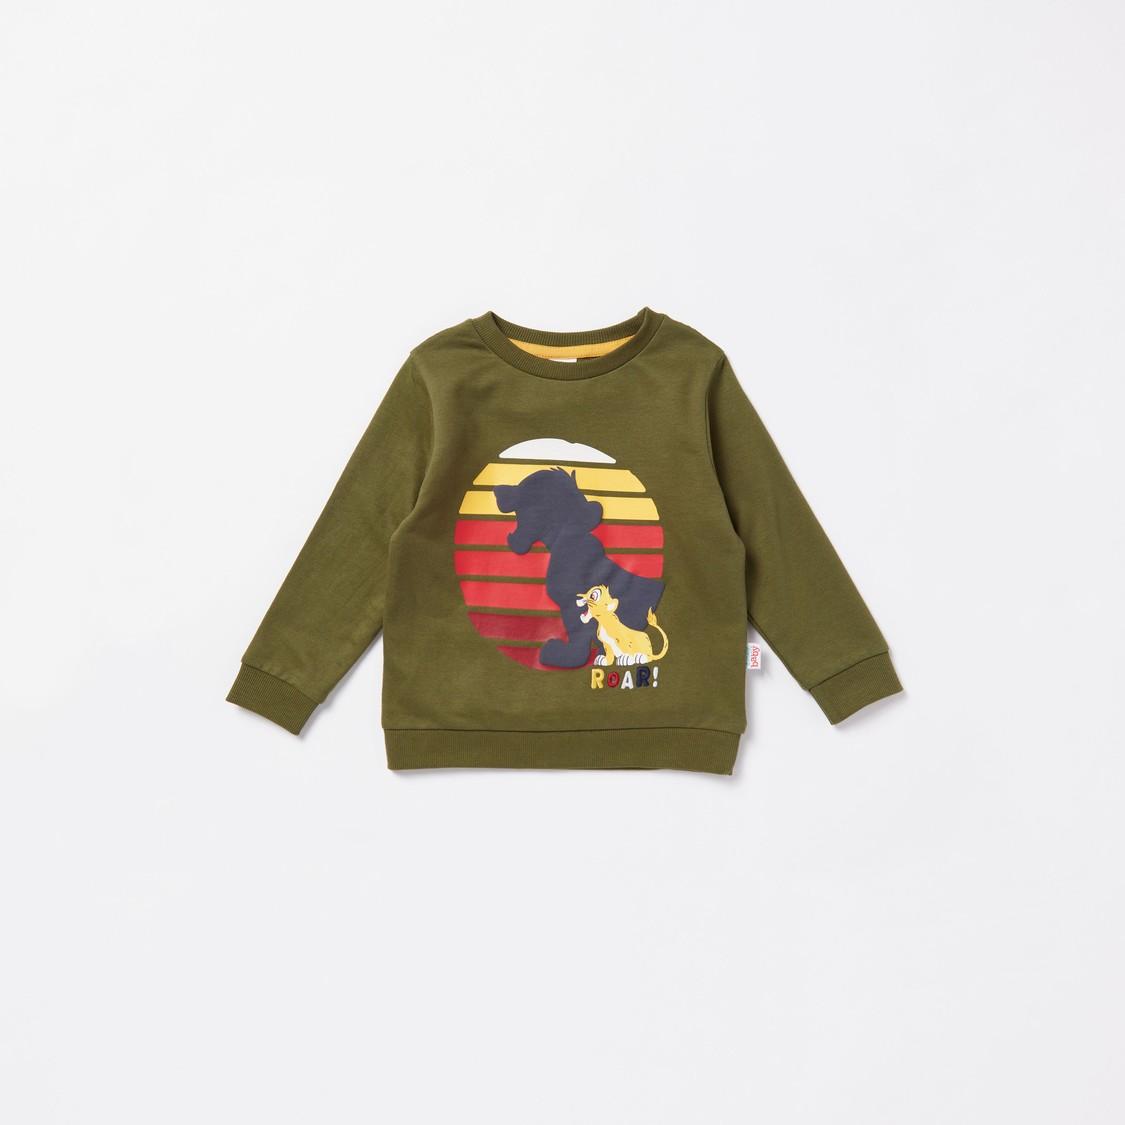 Simba Graphic Print Long Sleeves Sweatshirt with Jog Pants Set